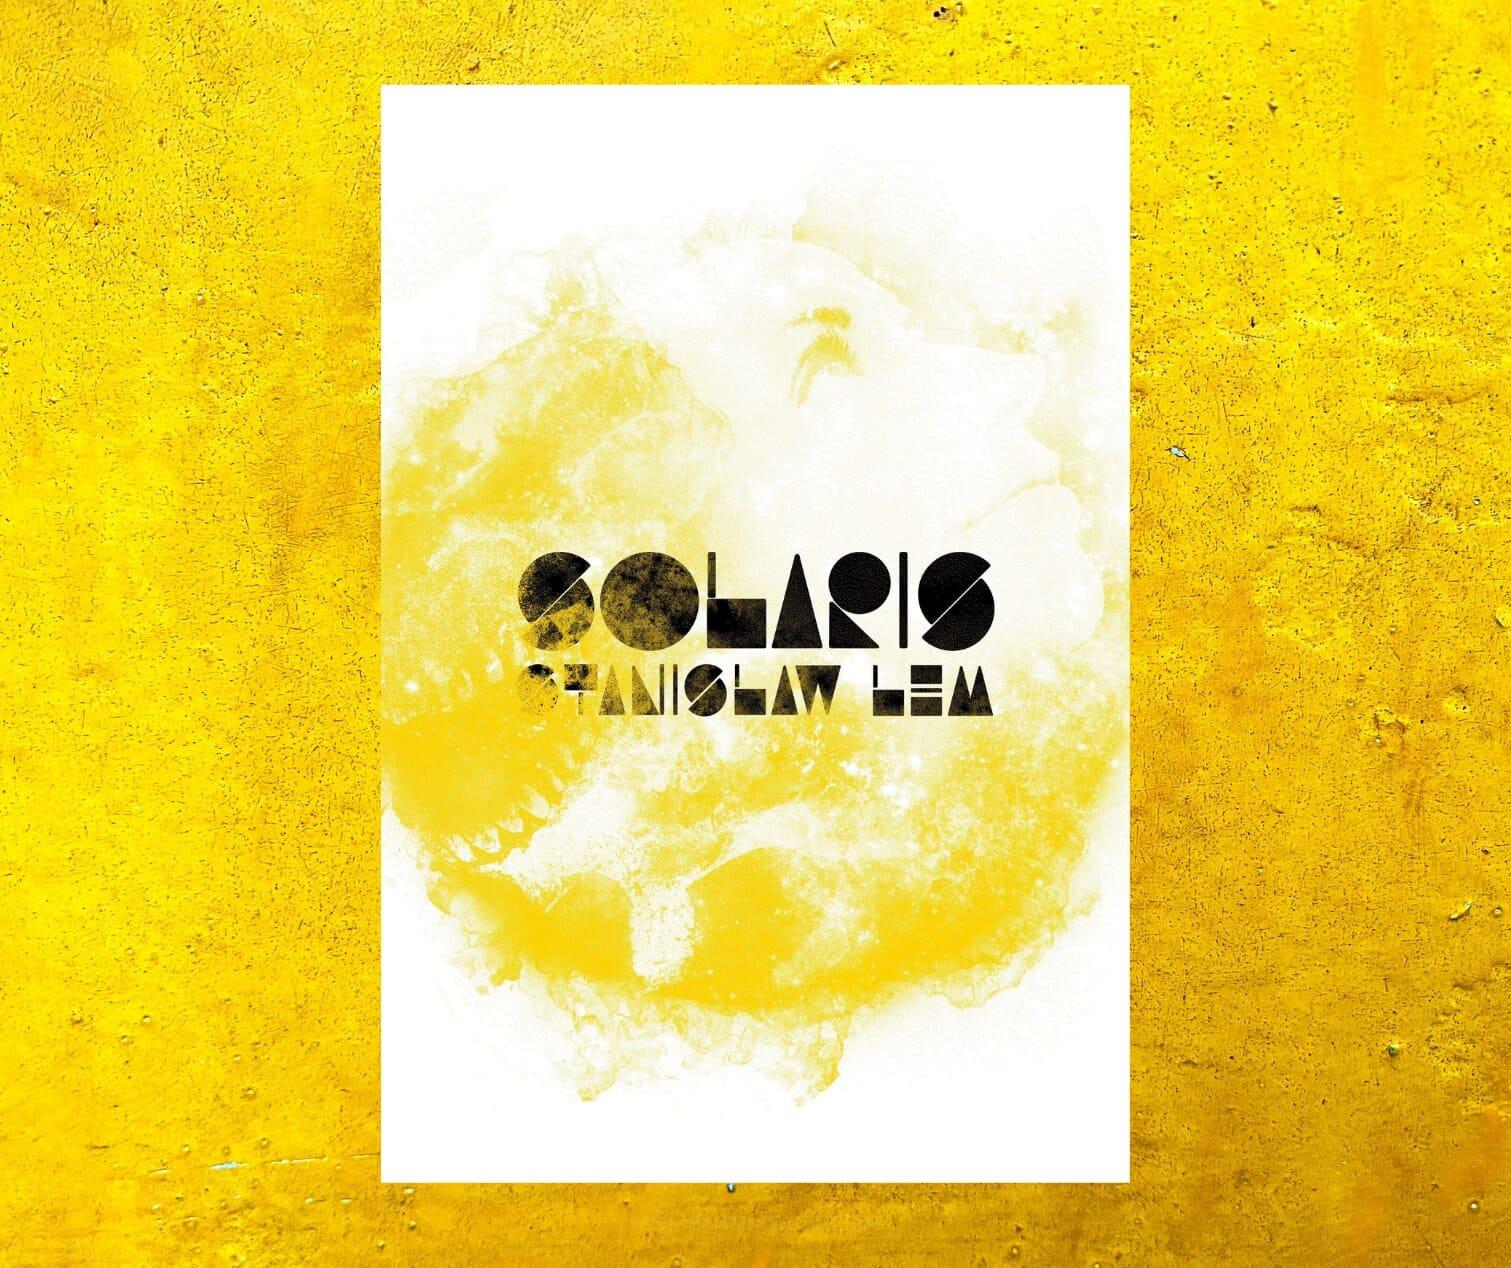 Resenha: Solaris, de Stanislaw Lem